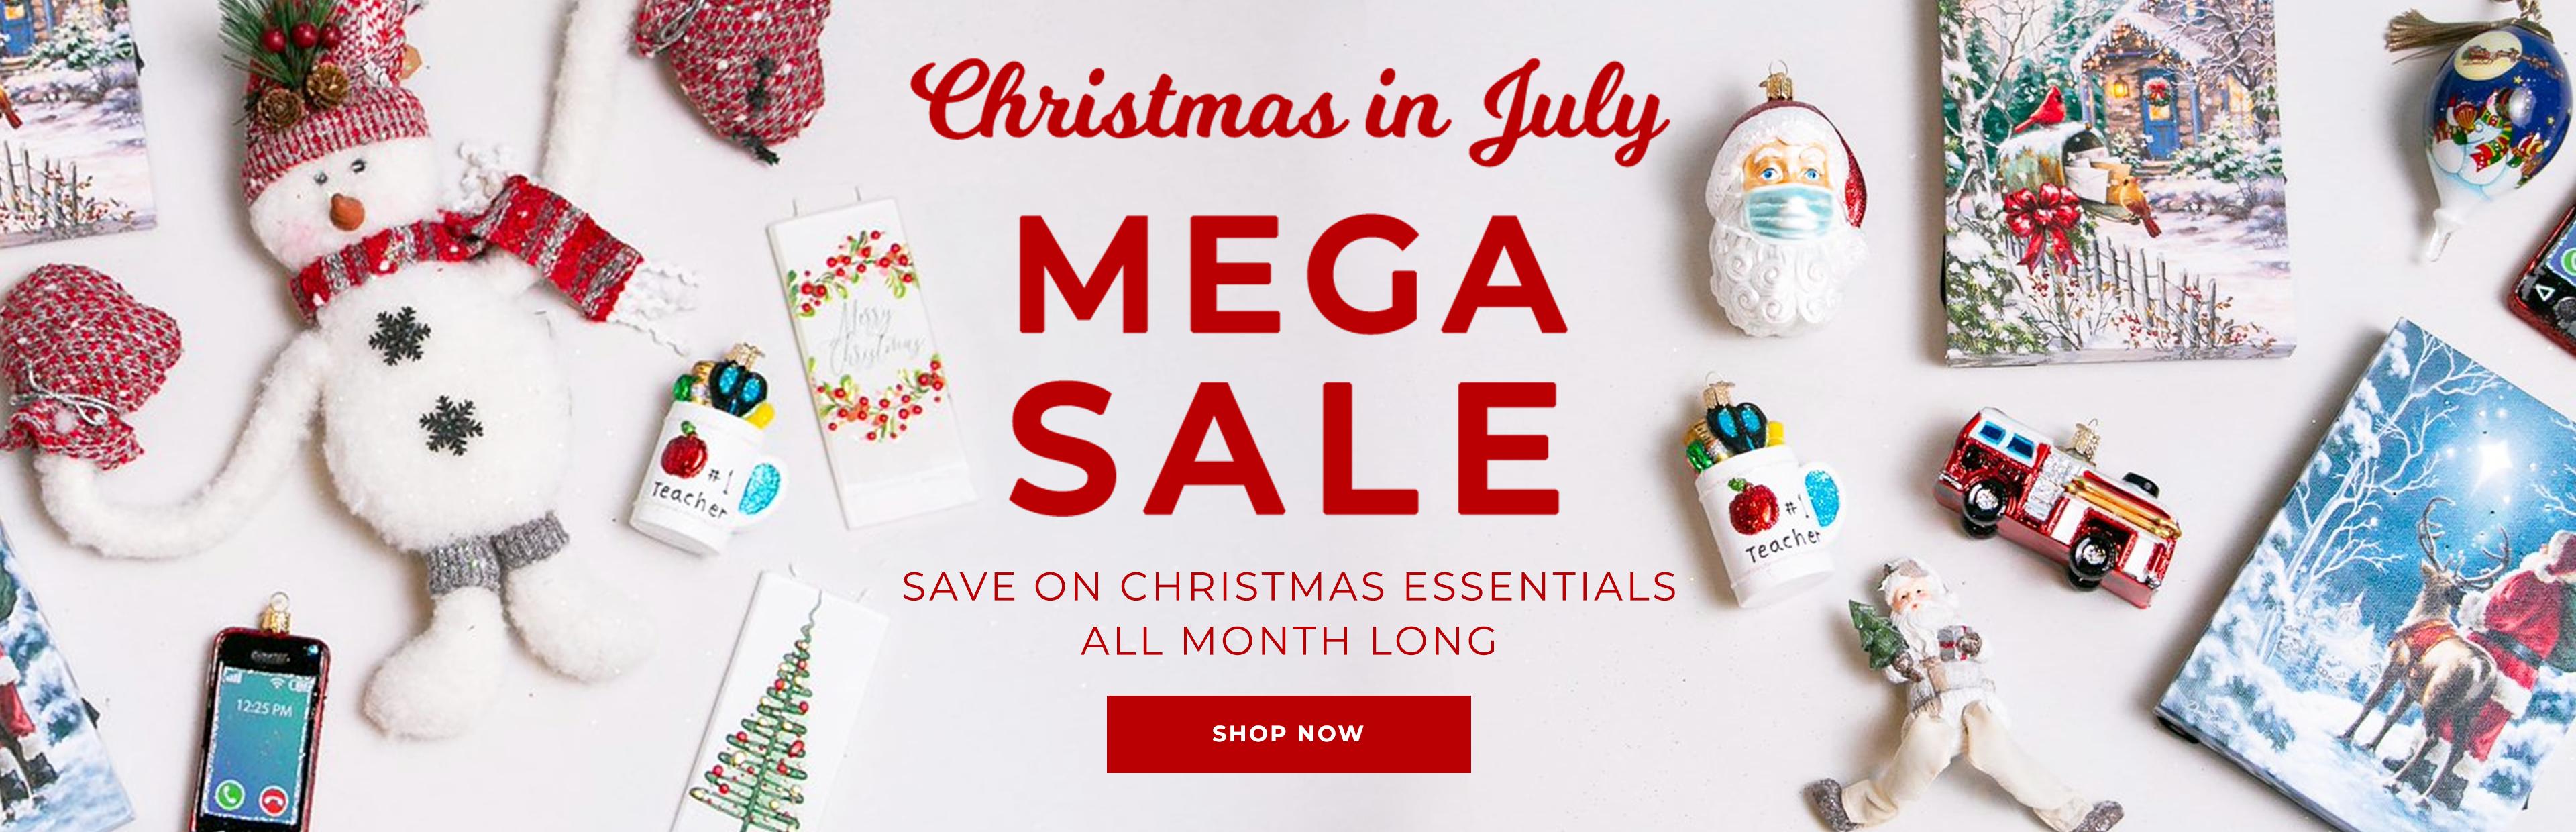 Christmas in July Mega Sale